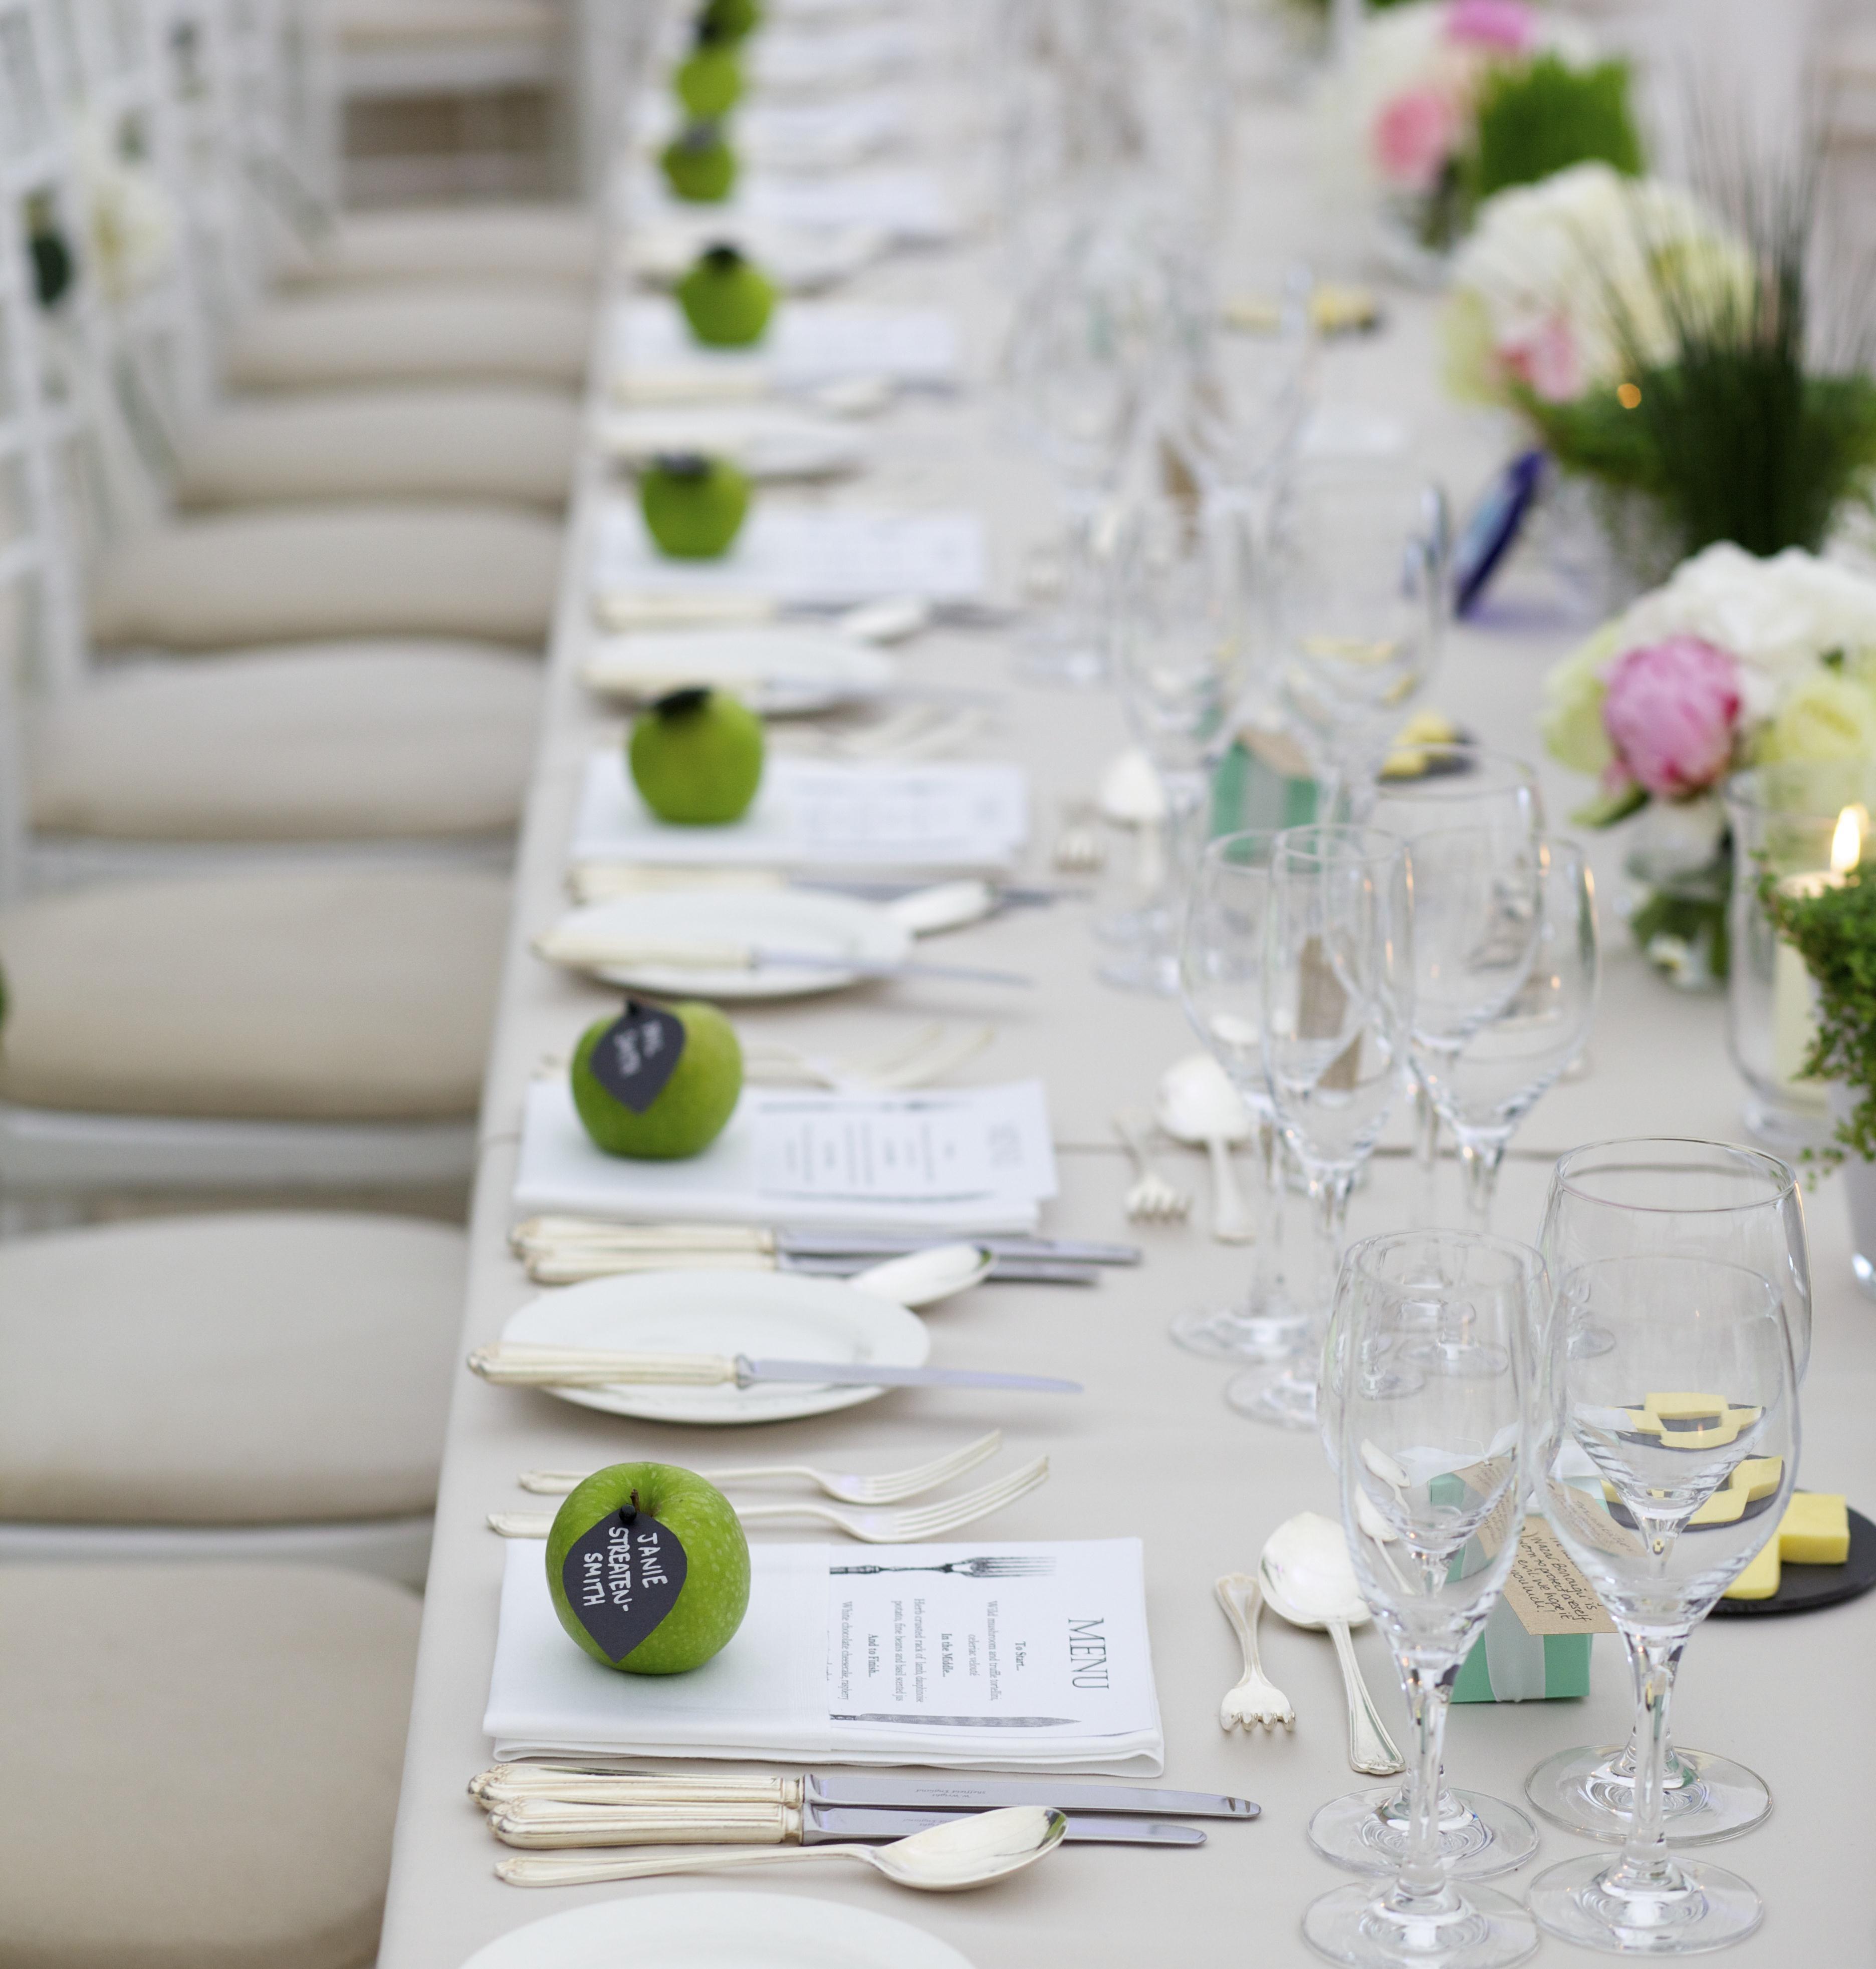 Venue Coordinator Vs Wedding Planner: What's The